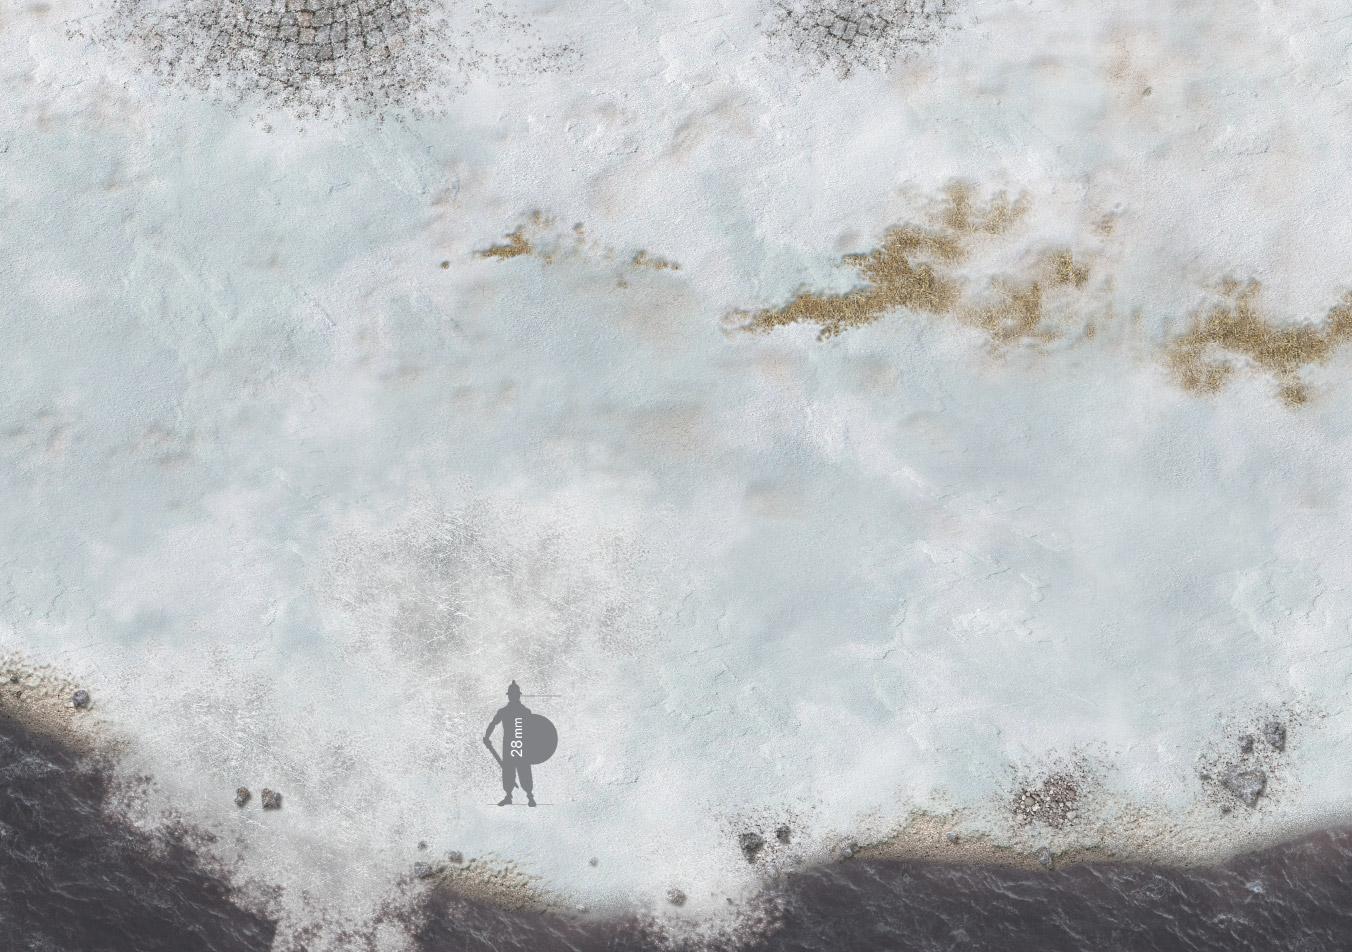 Clash of Oceans Battle Mat dungeons and dragons Battleboard warhammer wargaming